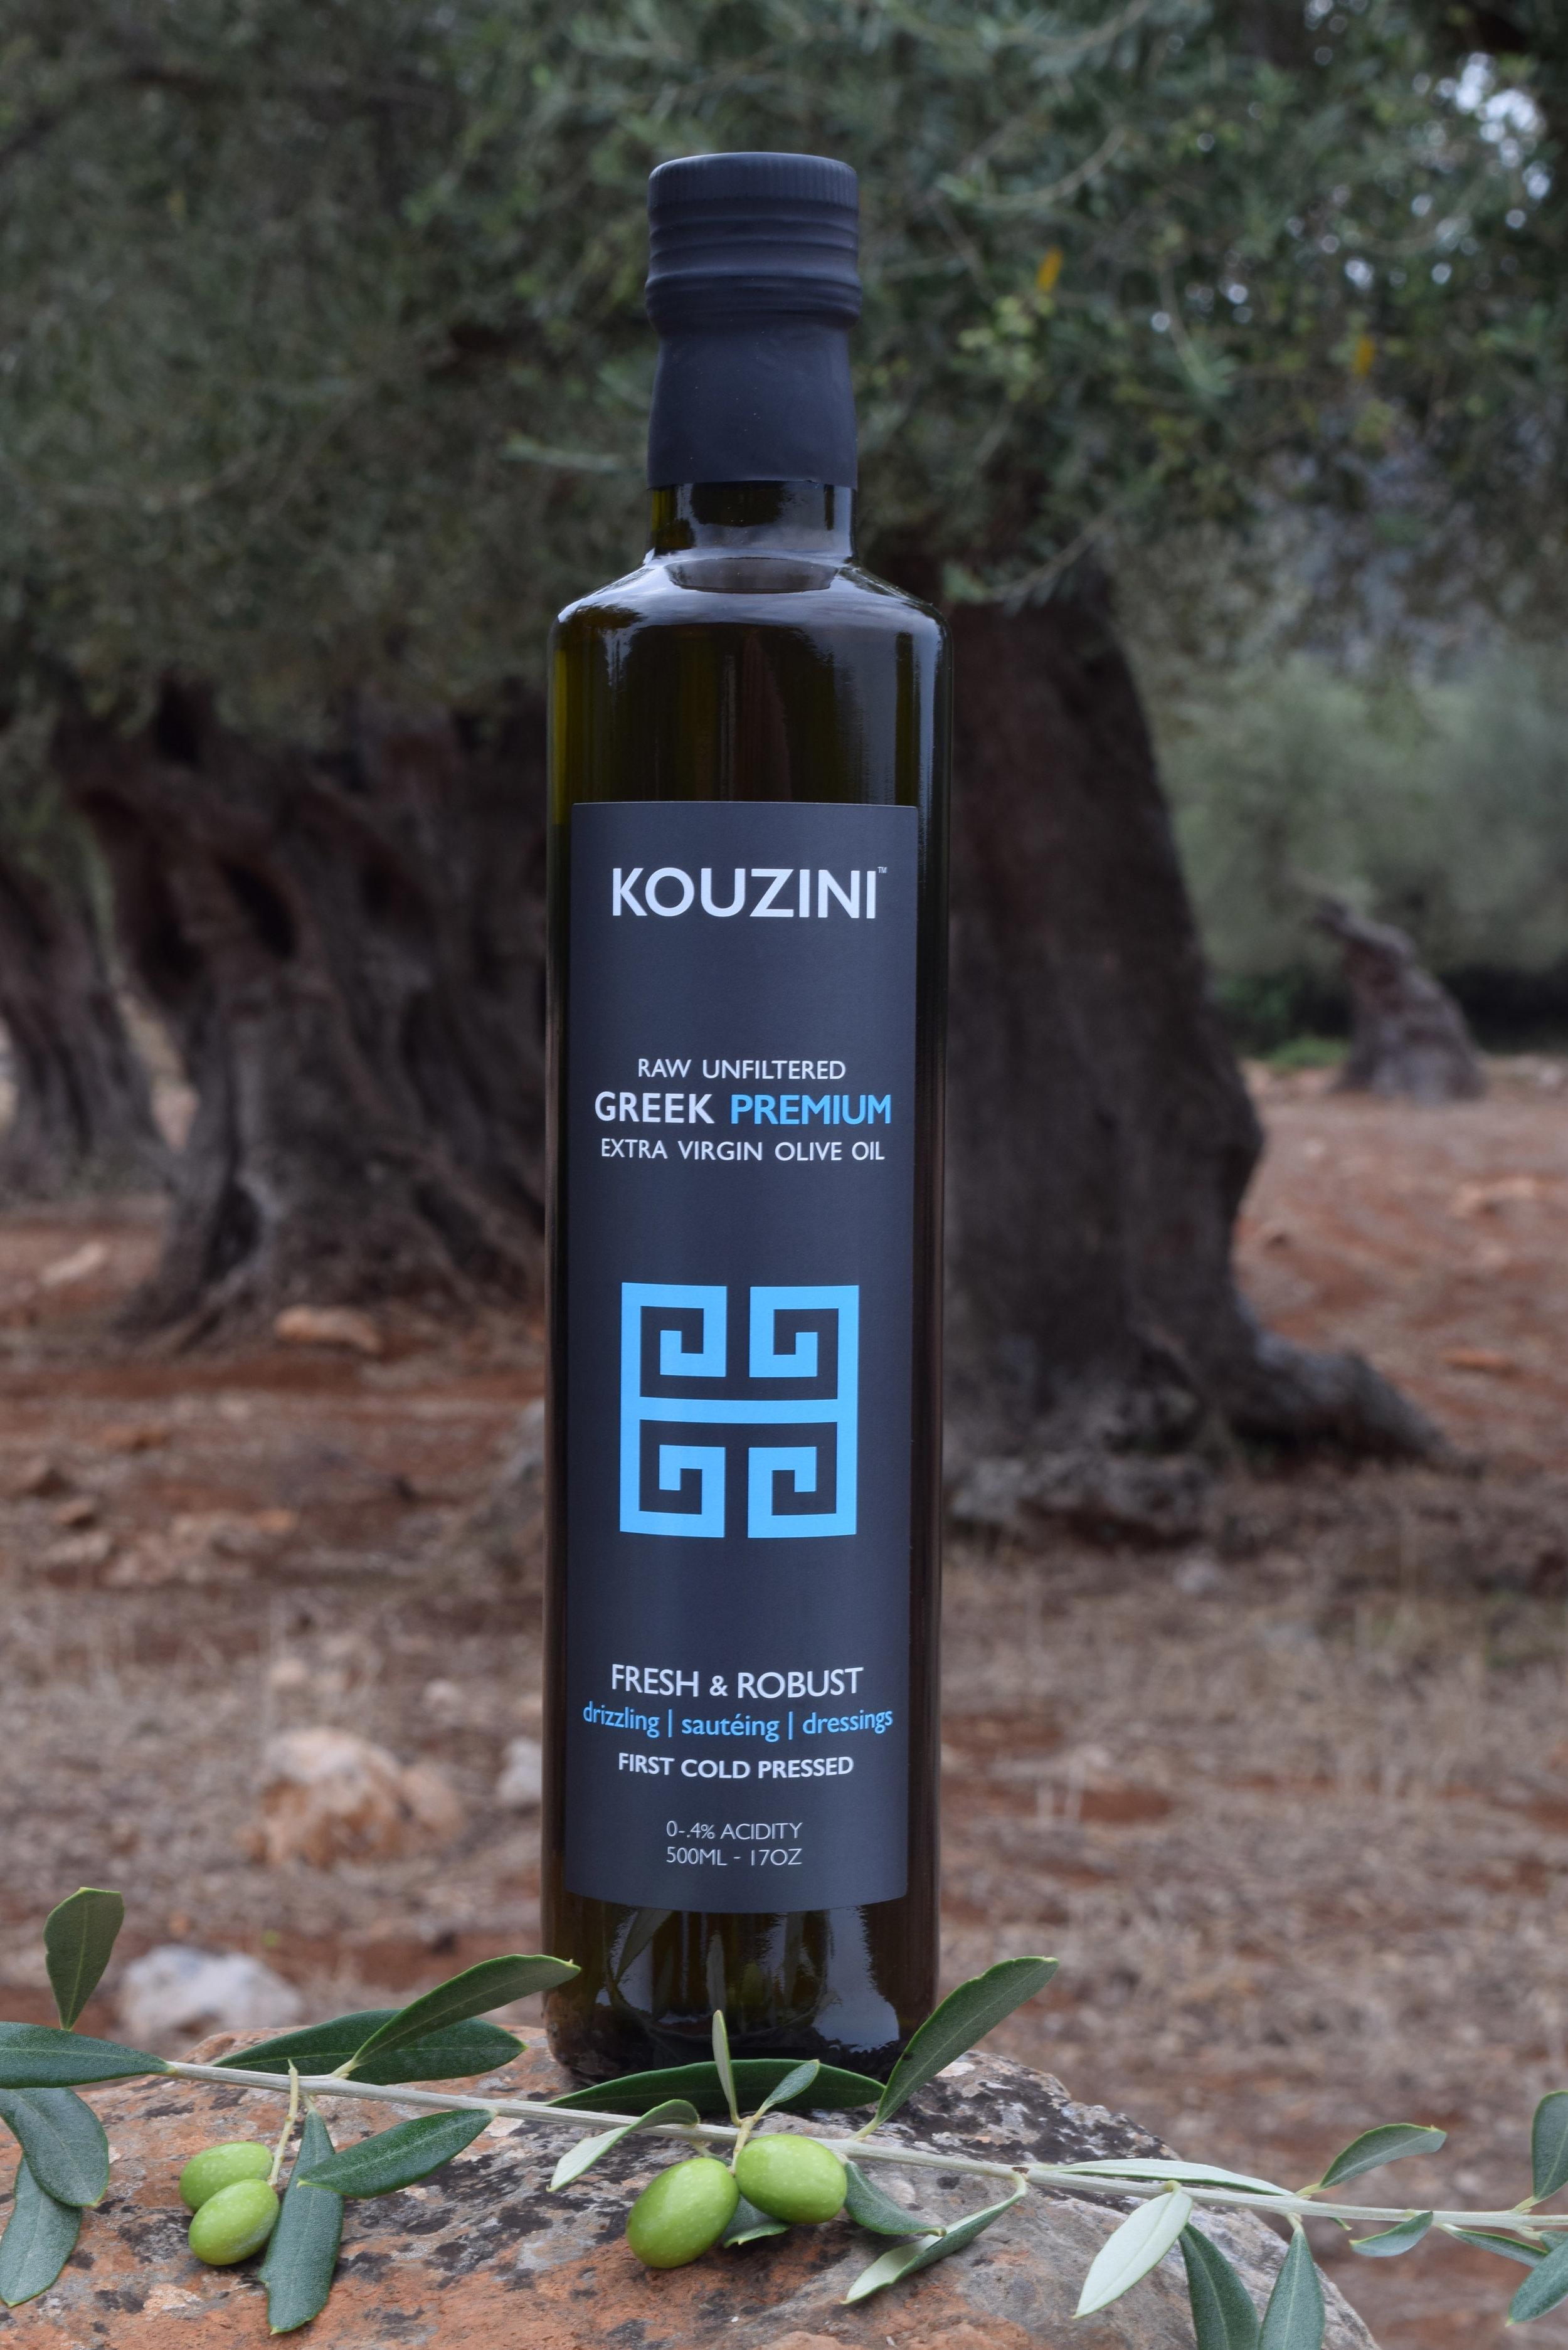 Unfiltered Ultra Premium Greek extra virgin olive oil.